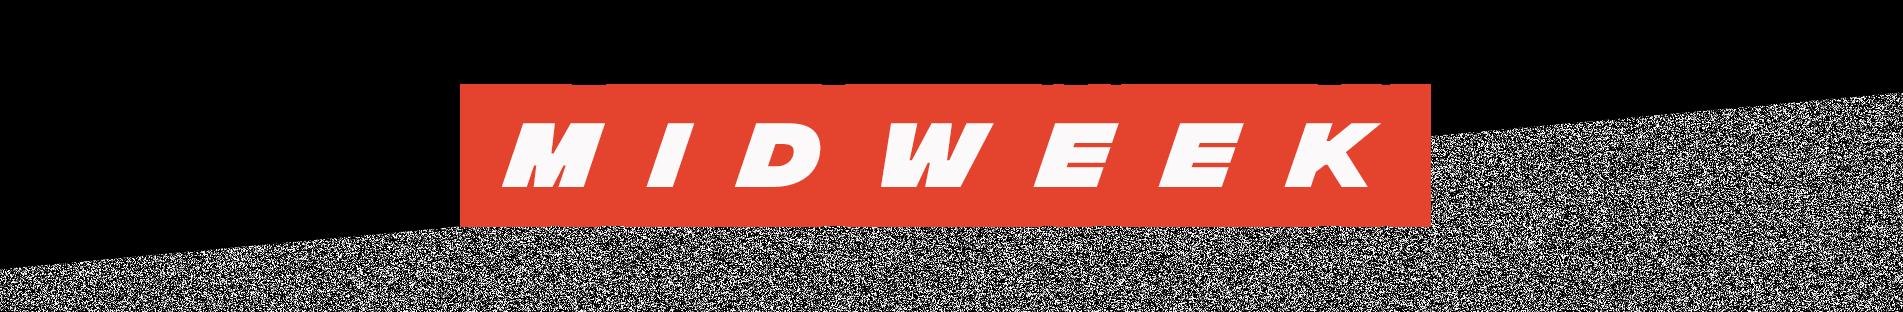 Brainerd Midweek Logo.png